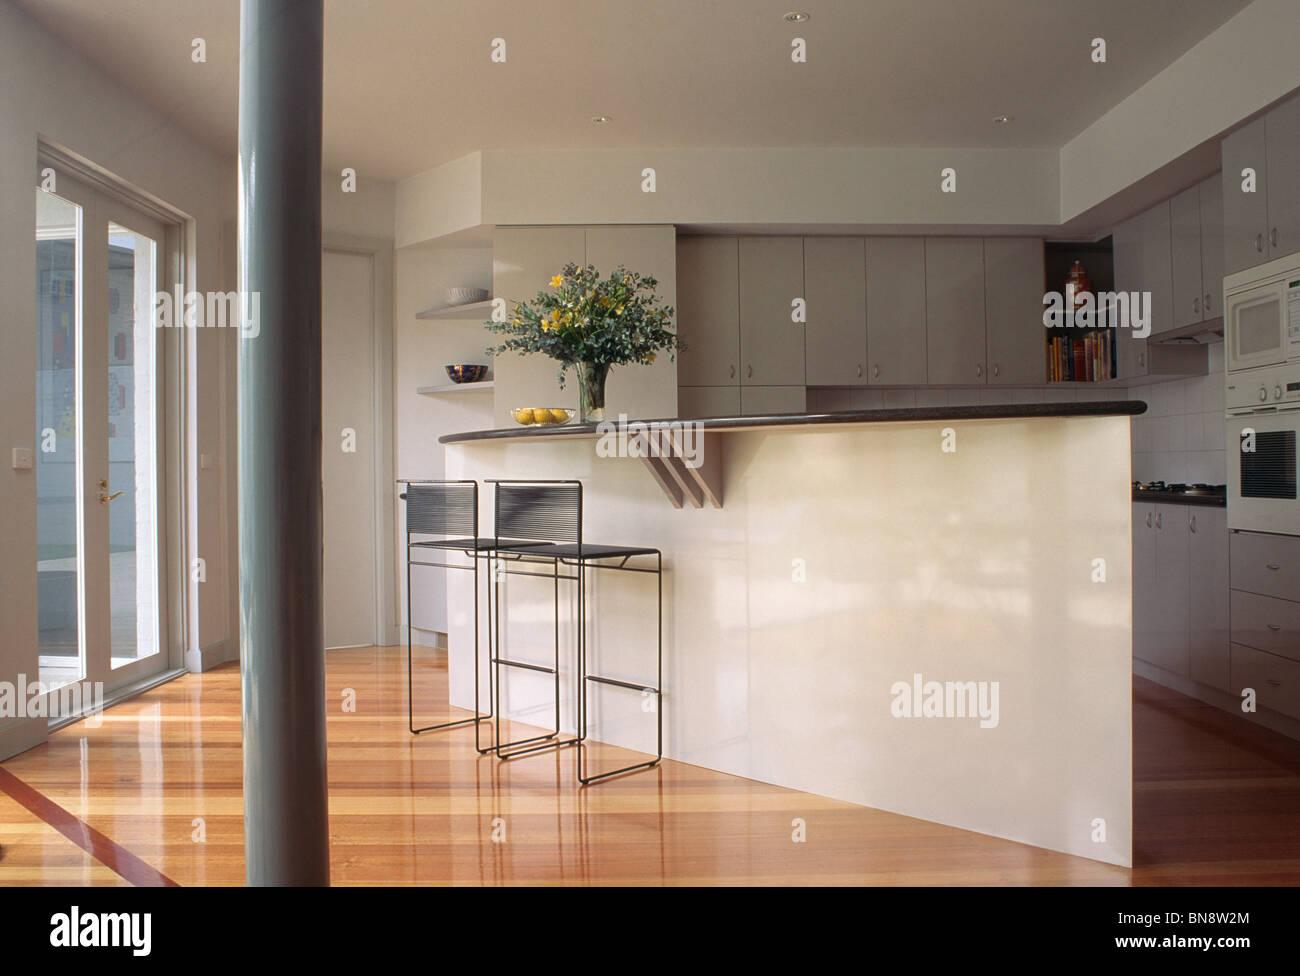 Open Plan Kitchen Breakfast Bar. Narrow pillar and wooden flooring in modern open plan kitchen with stools  at breakfast bar